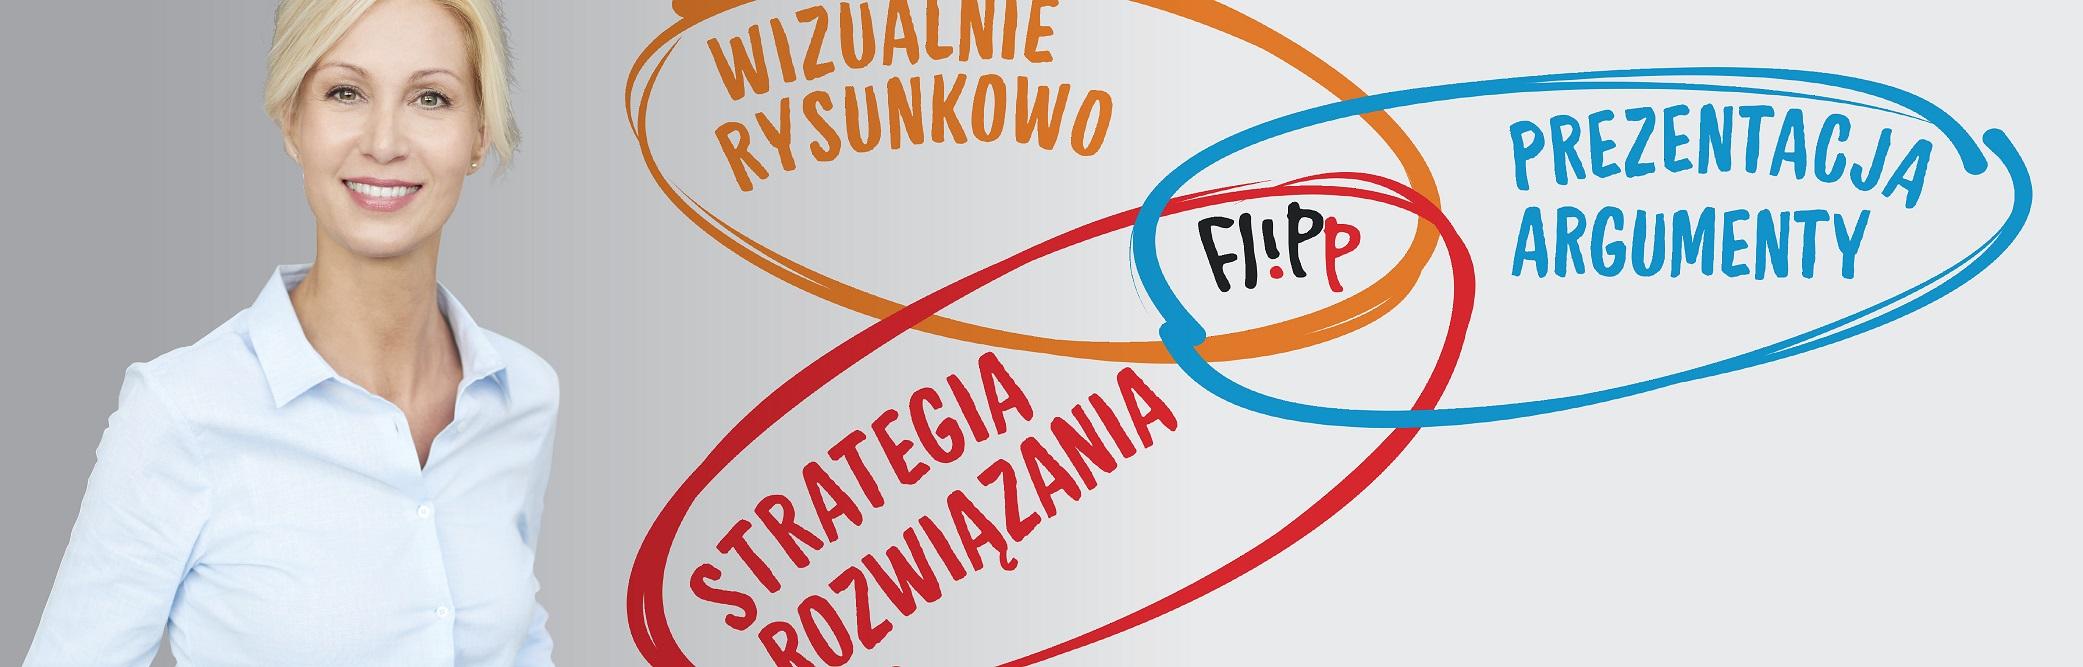 FLIPperformer – CO TO JEST?